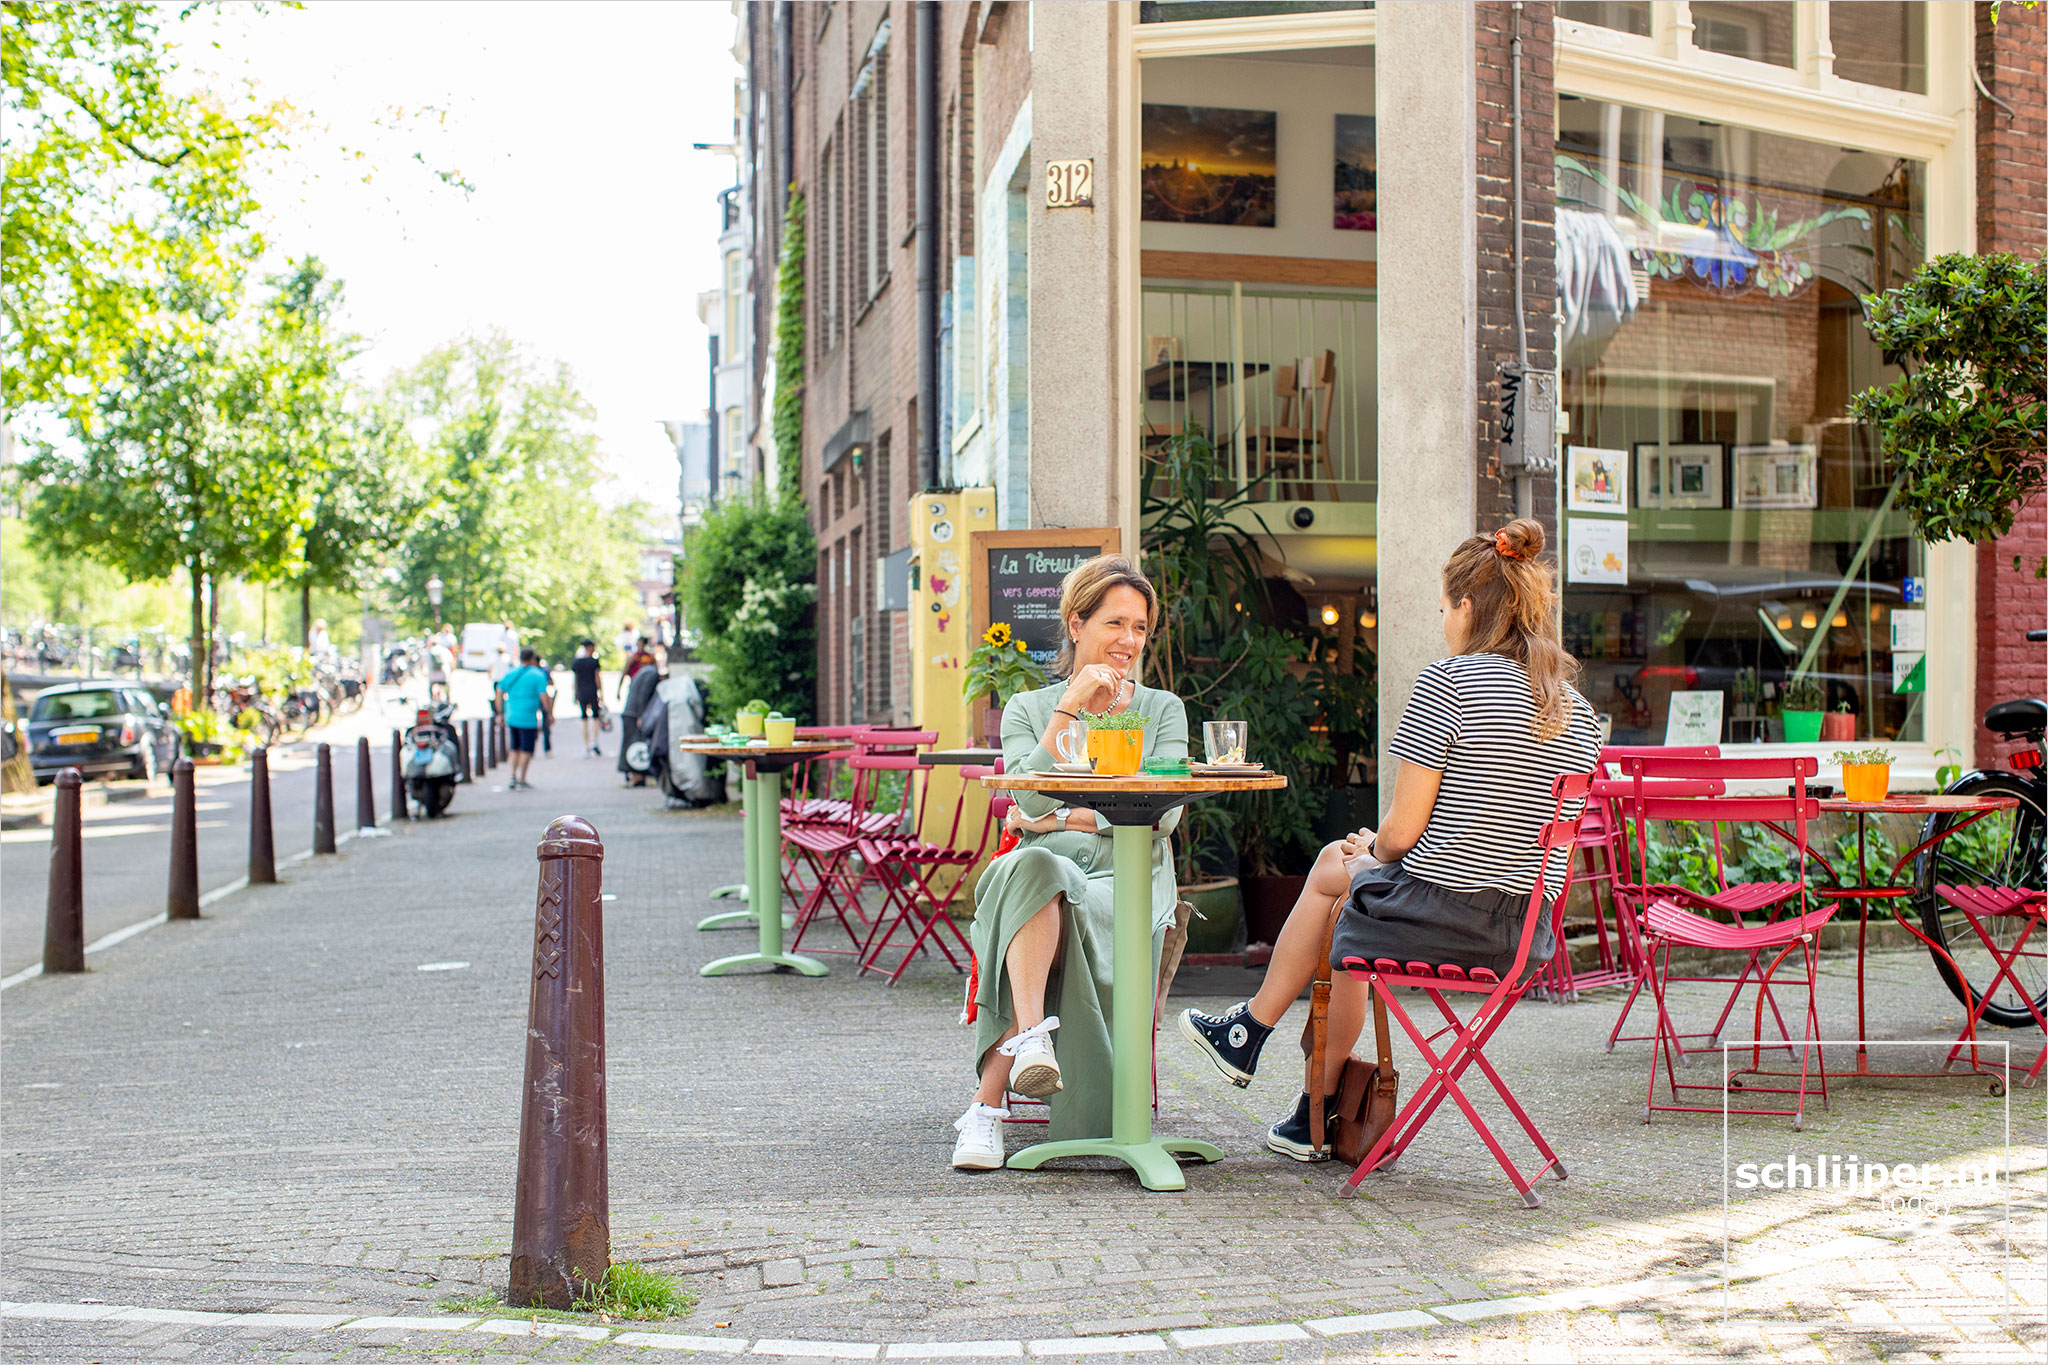 The Netherlands, Amsterdam, 9 juni 2021